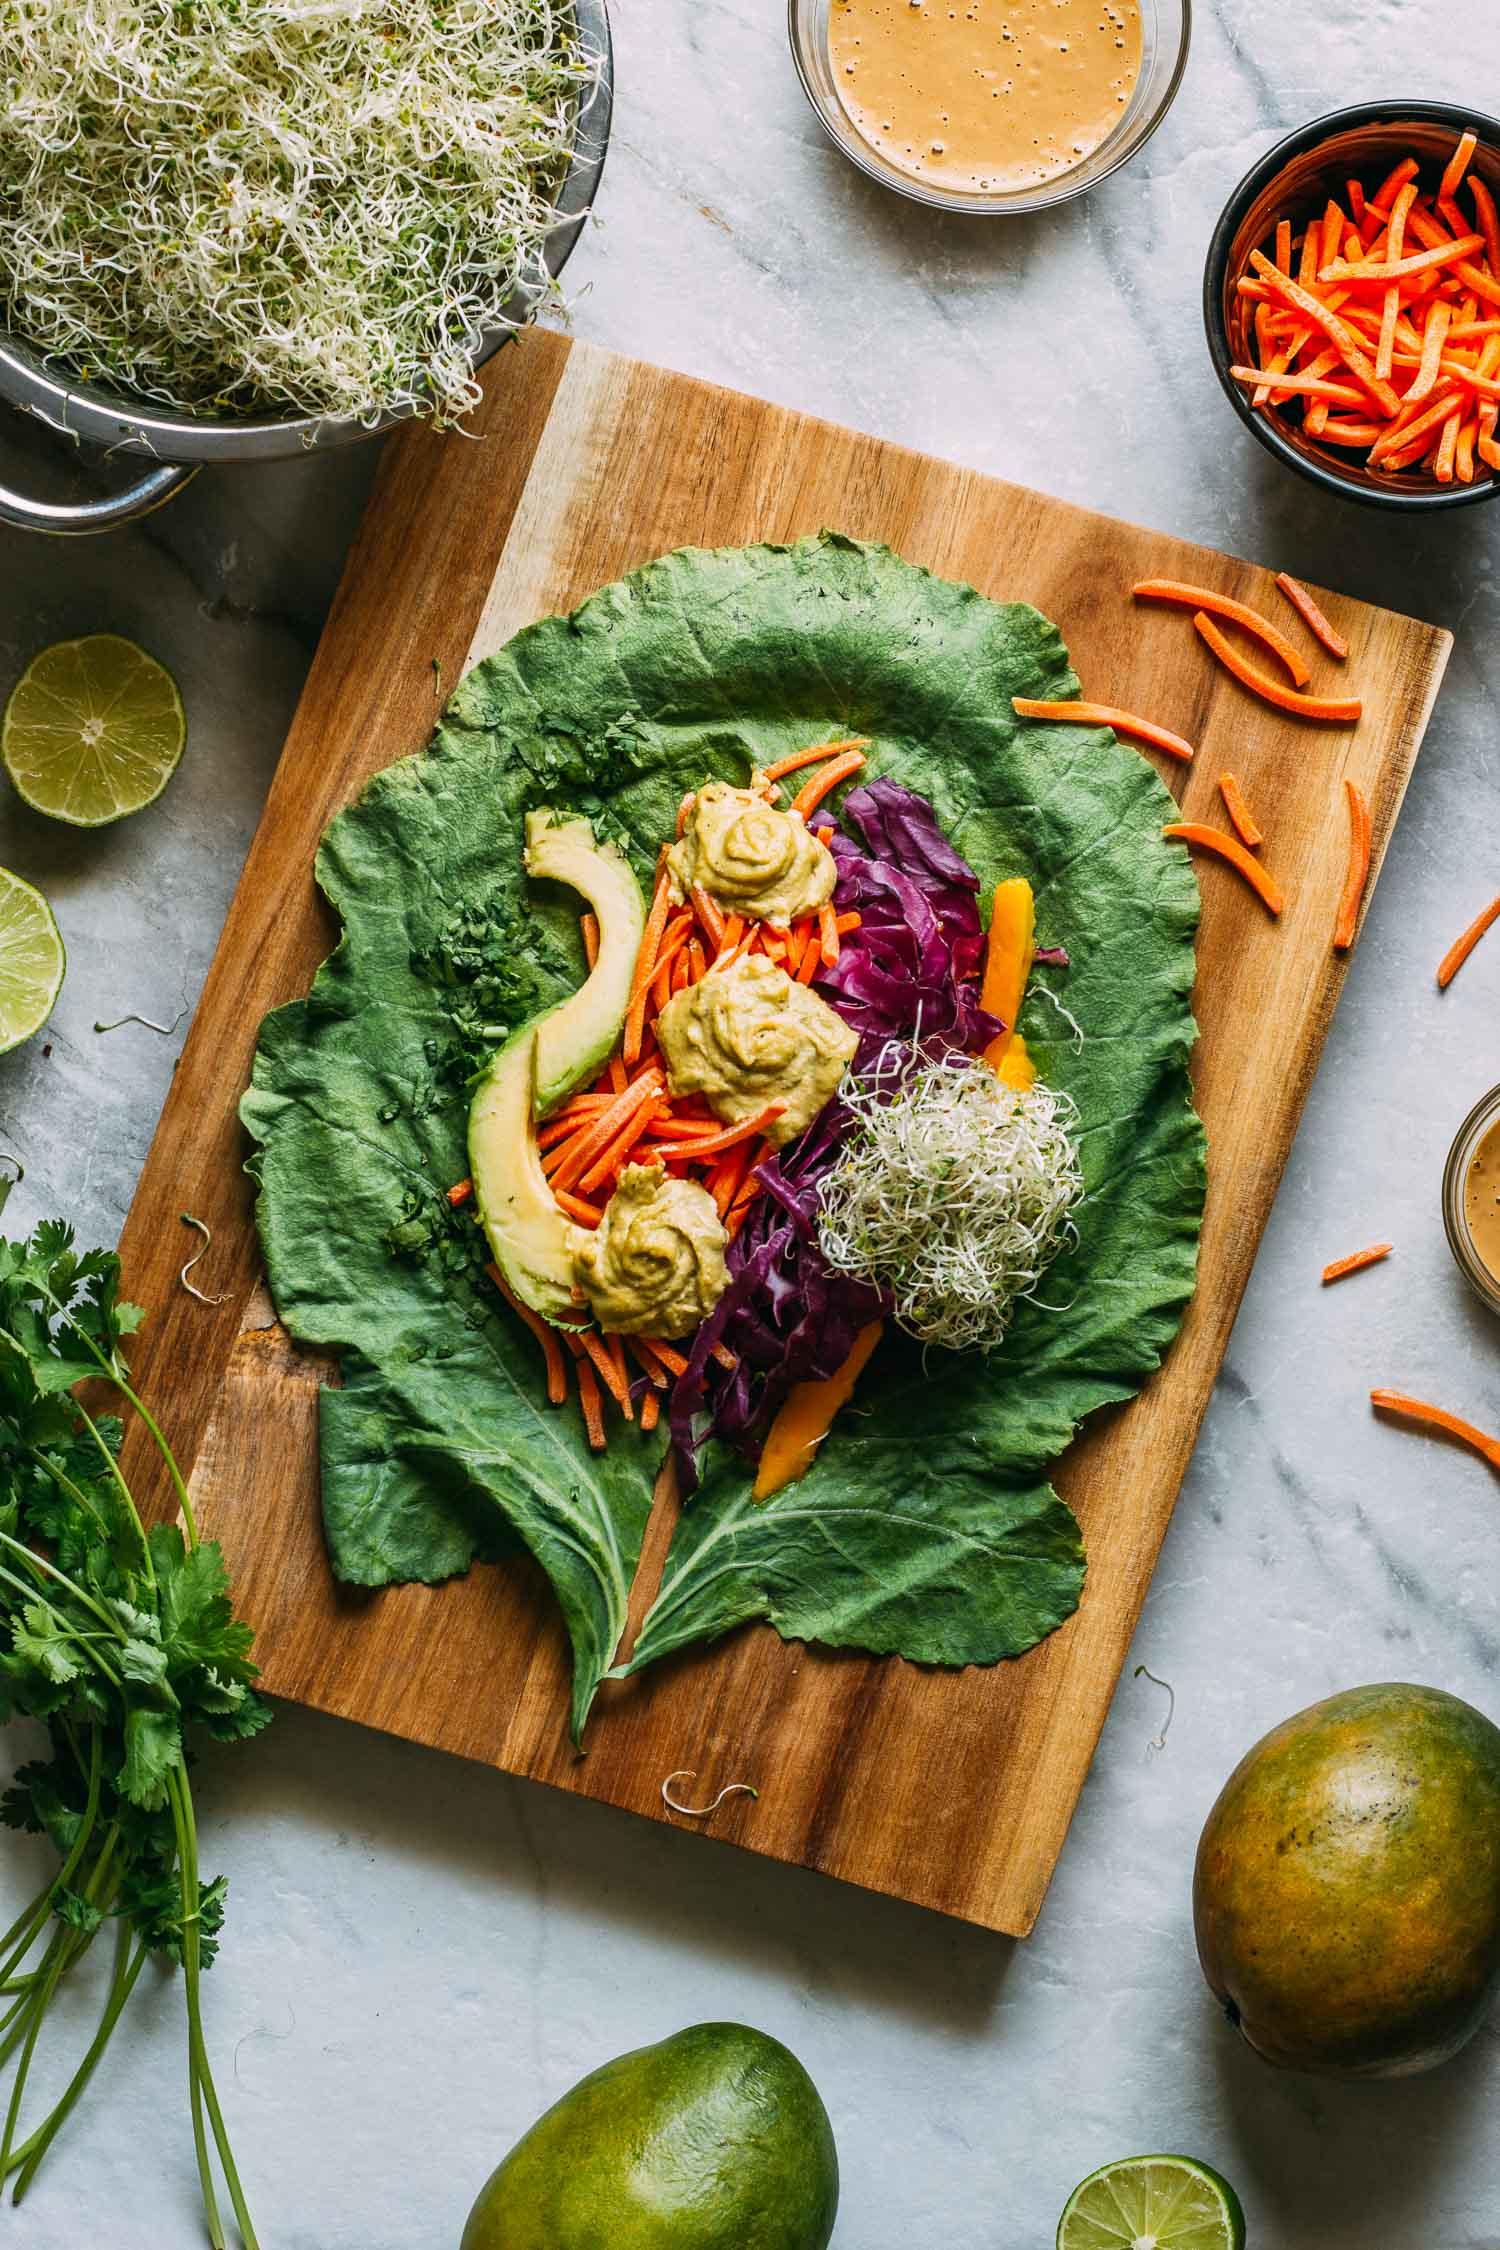 Mango Cashew Collard Wrap #collard #wraps #vegan #vegetarian #avocado #mango #sprouts #greens #recipe #peanut #sauce #thai #wrap #wfpbno #wfpb #raw